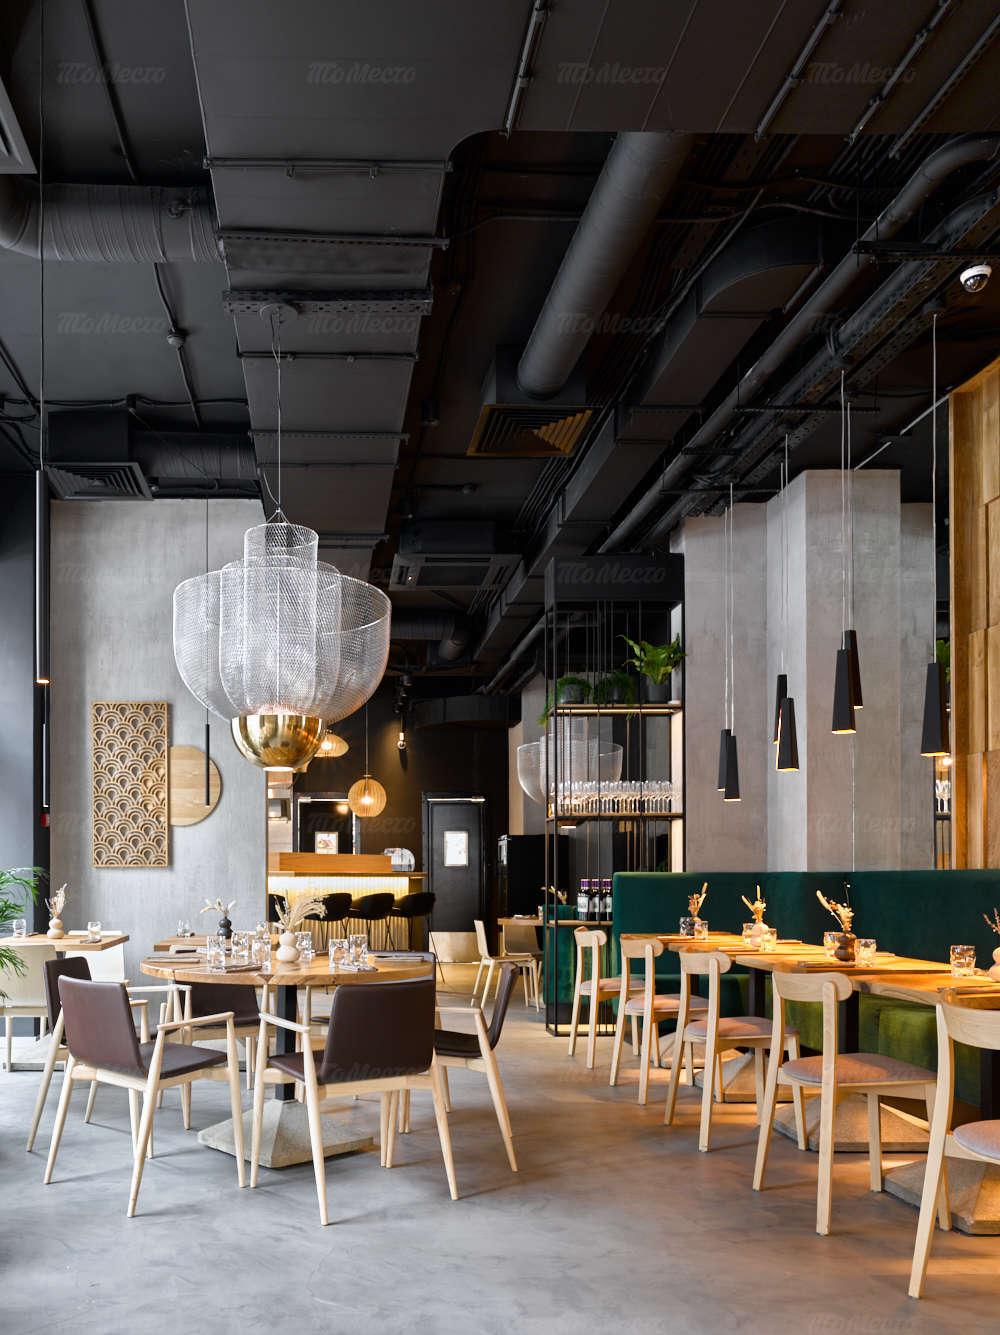 Ресторан Asia Inn (Азиа Инн) на бульваре Генерала Карбышева фото 2